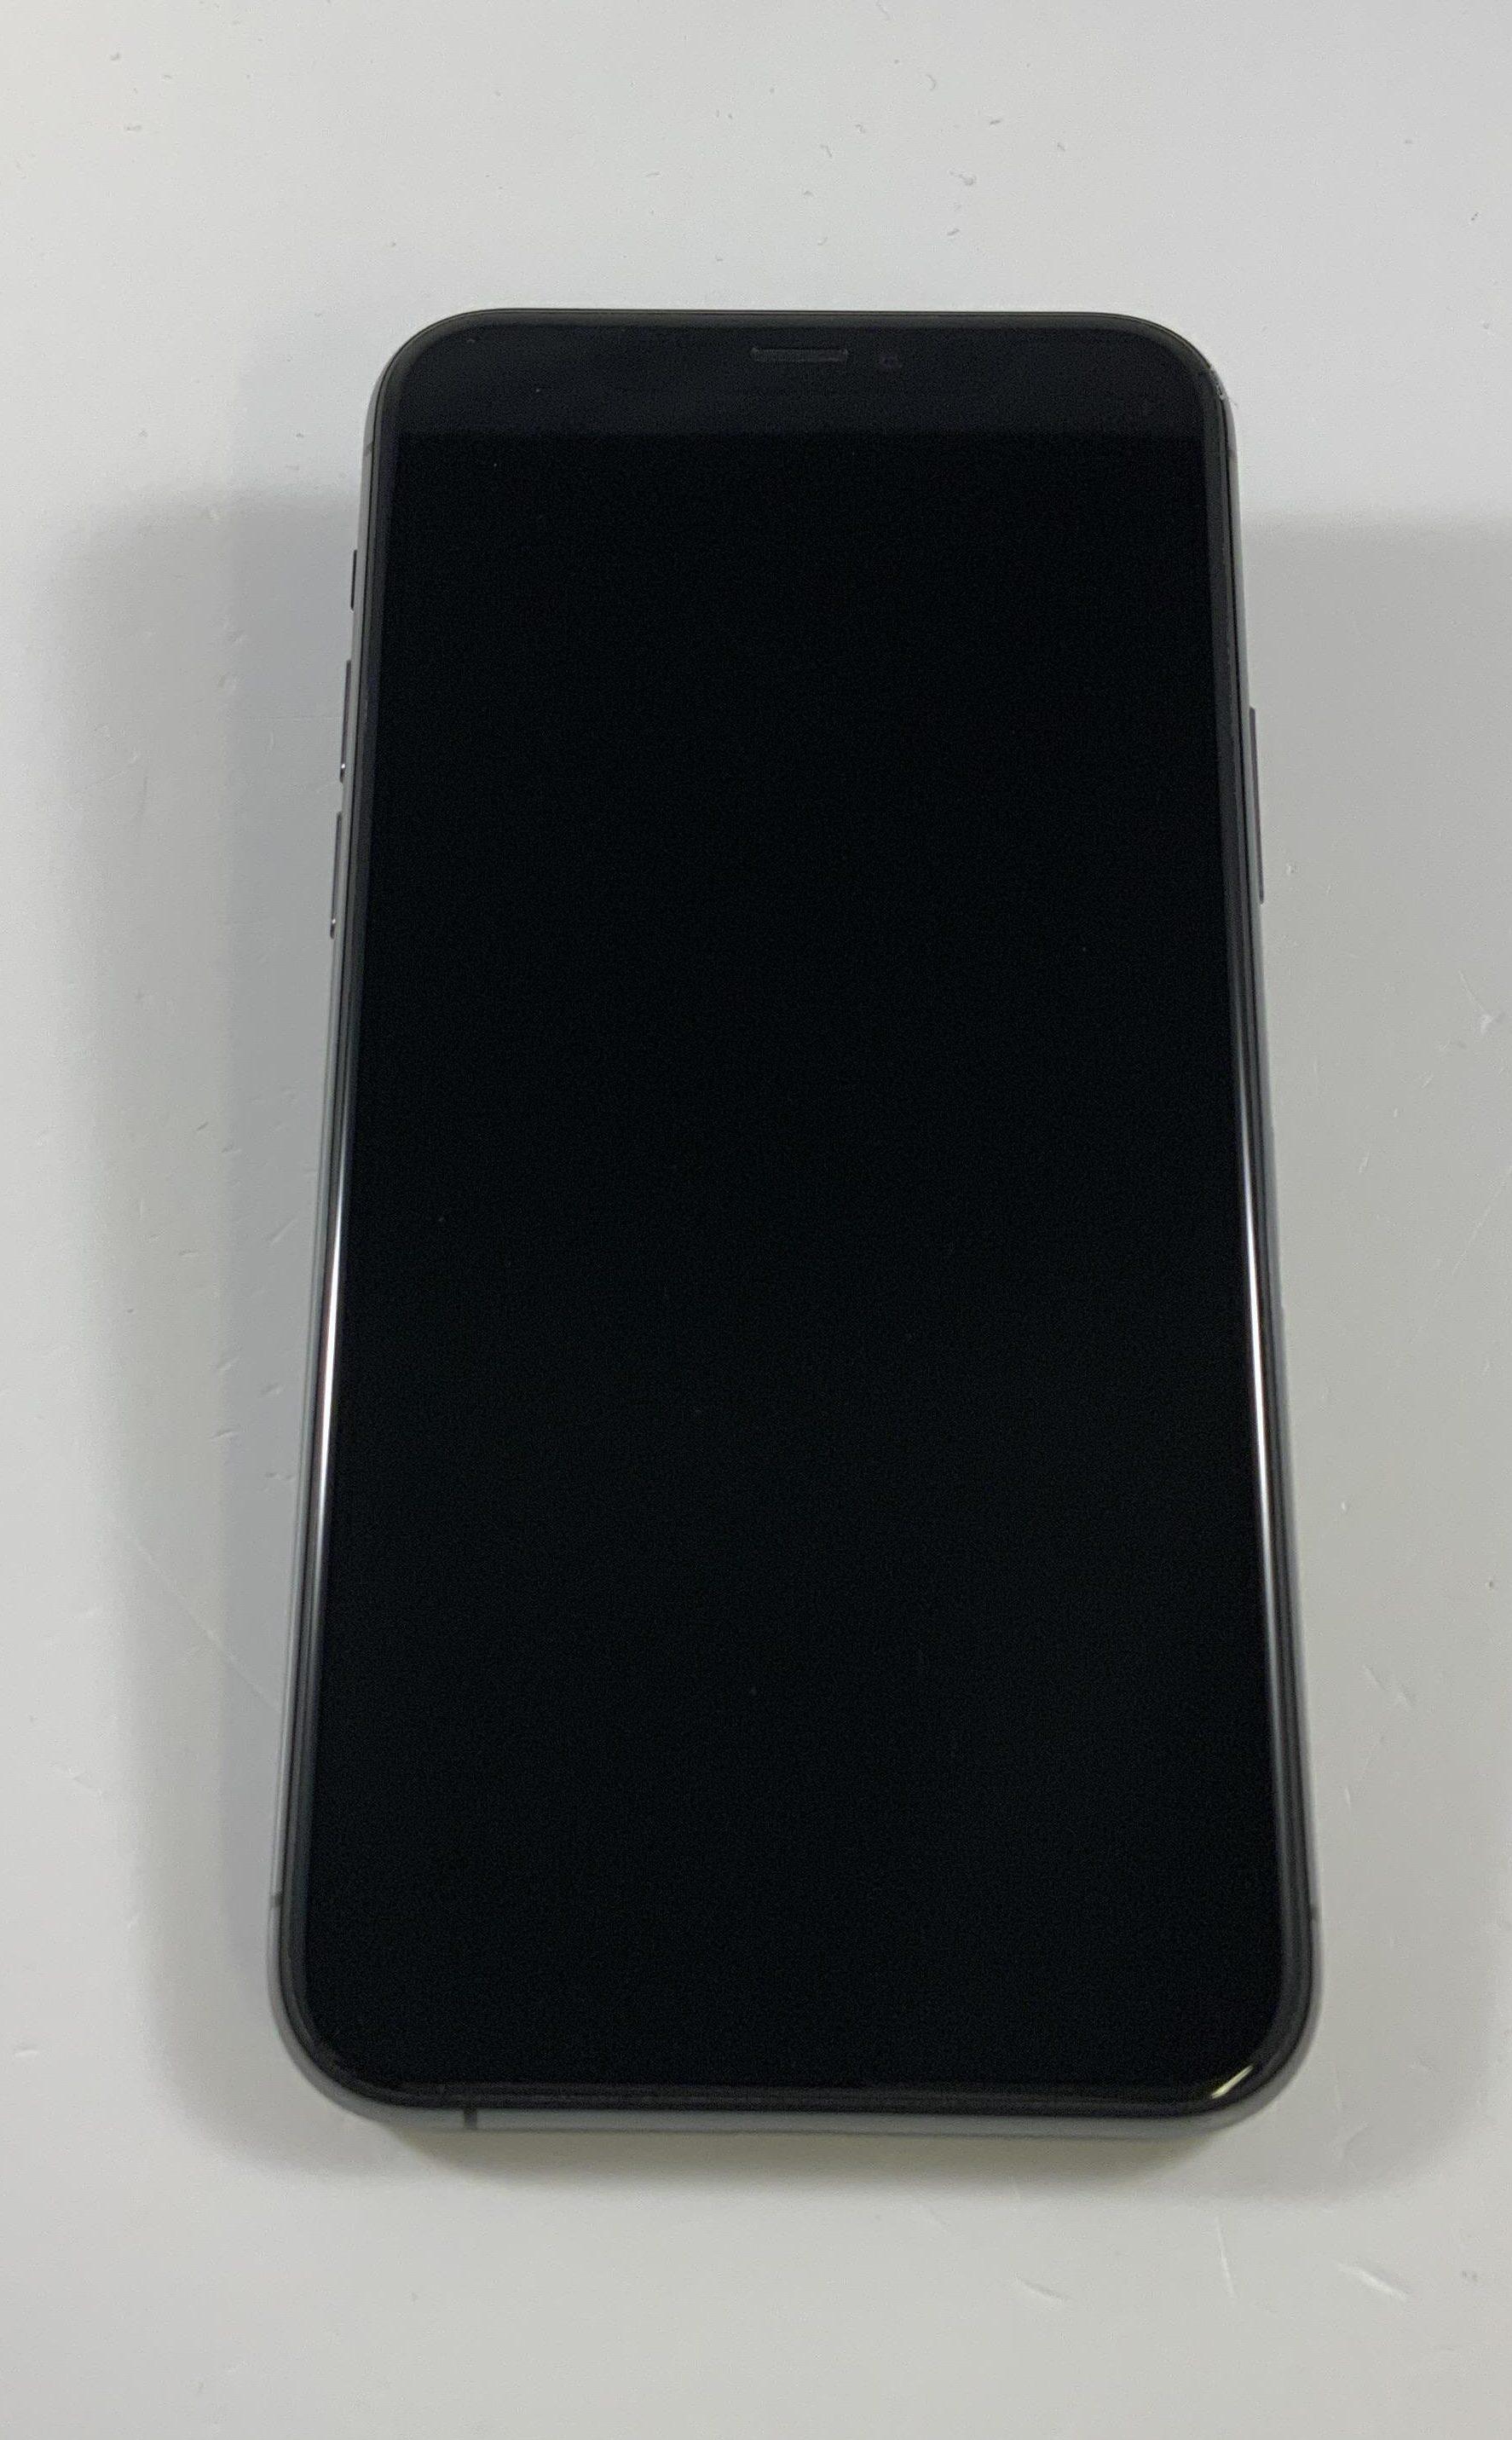 iPhone 11 Pro 64GB, 64GB, Space Gray, imagen 1